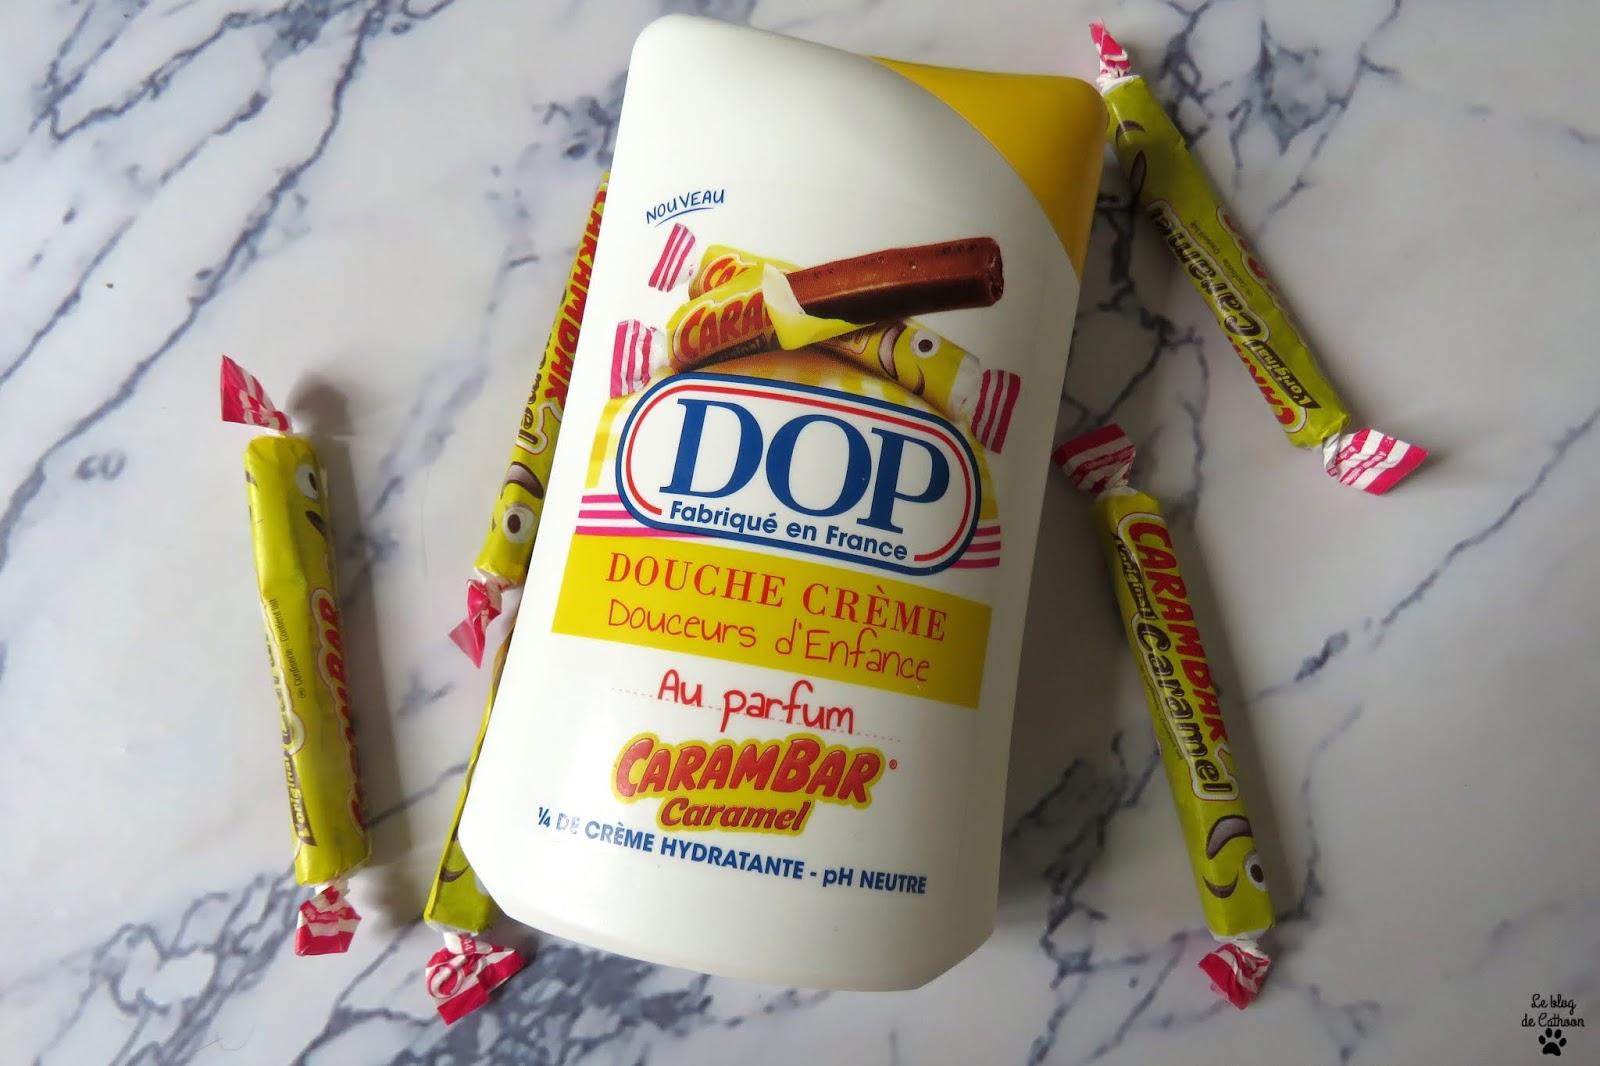 Carambar Caramel - Douche Crème - Douceurs d'Enfance - Dop